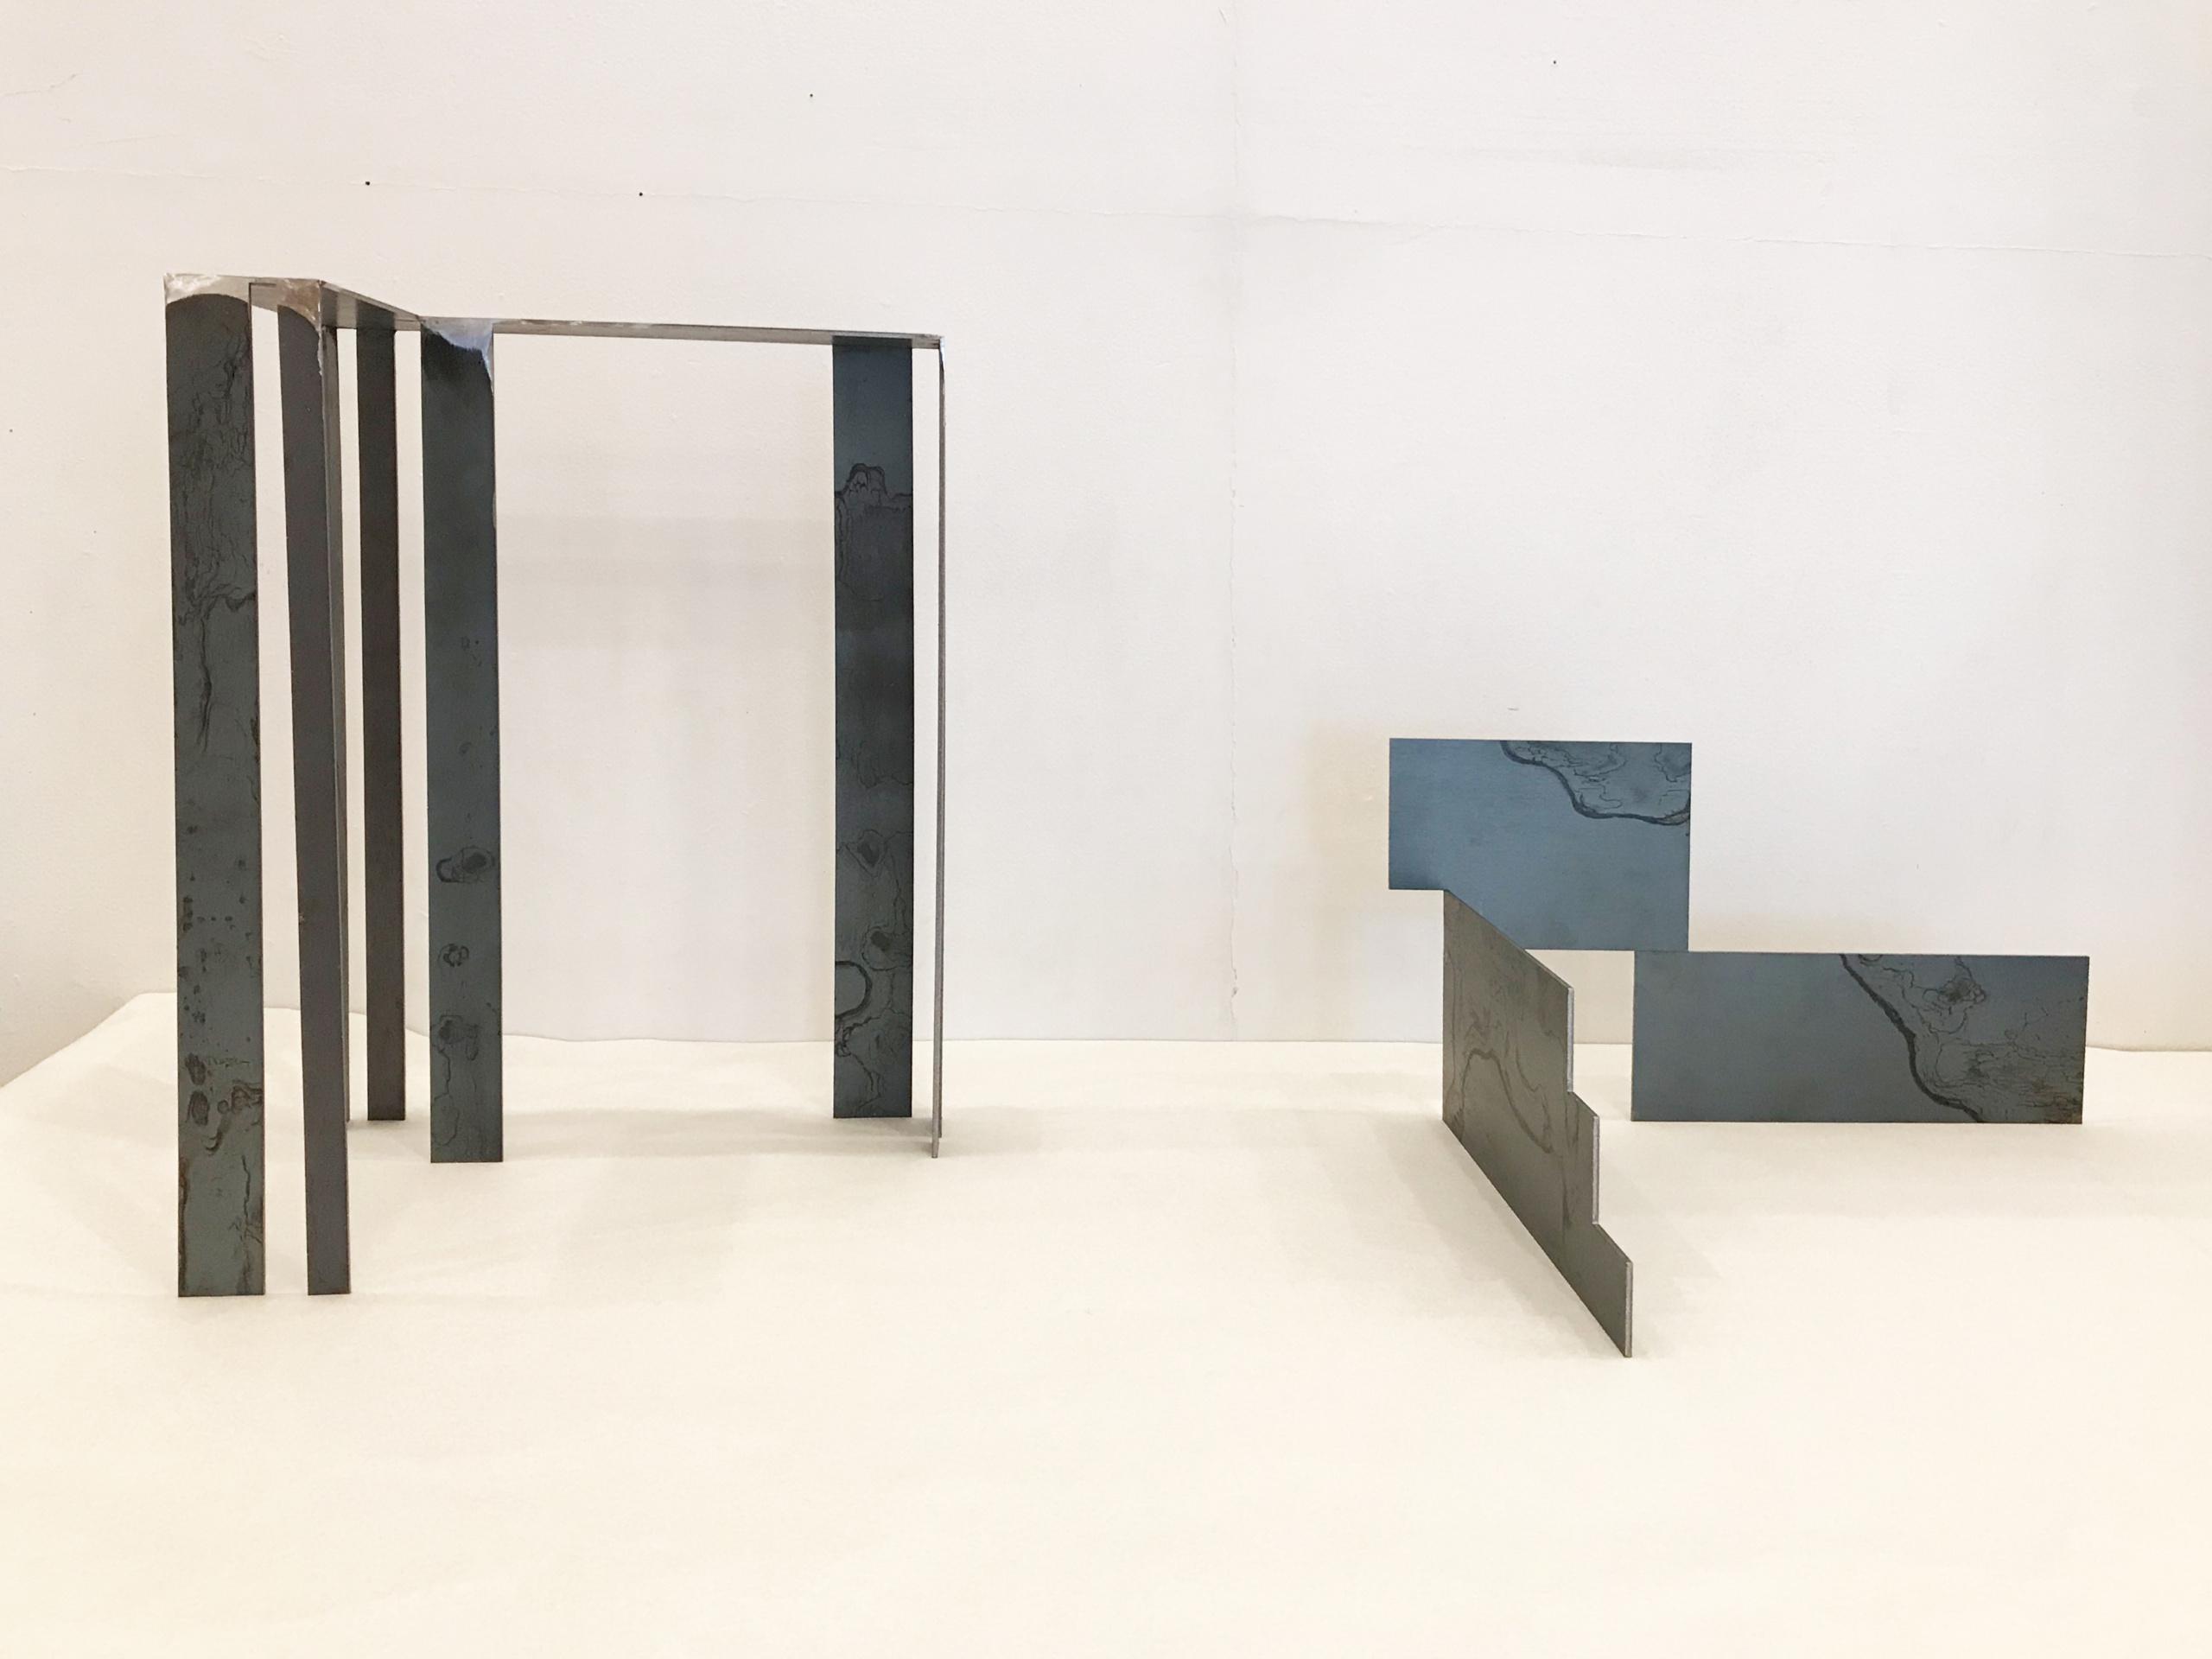 Anne Kristin Kristiansen: Architectonical Sculptures